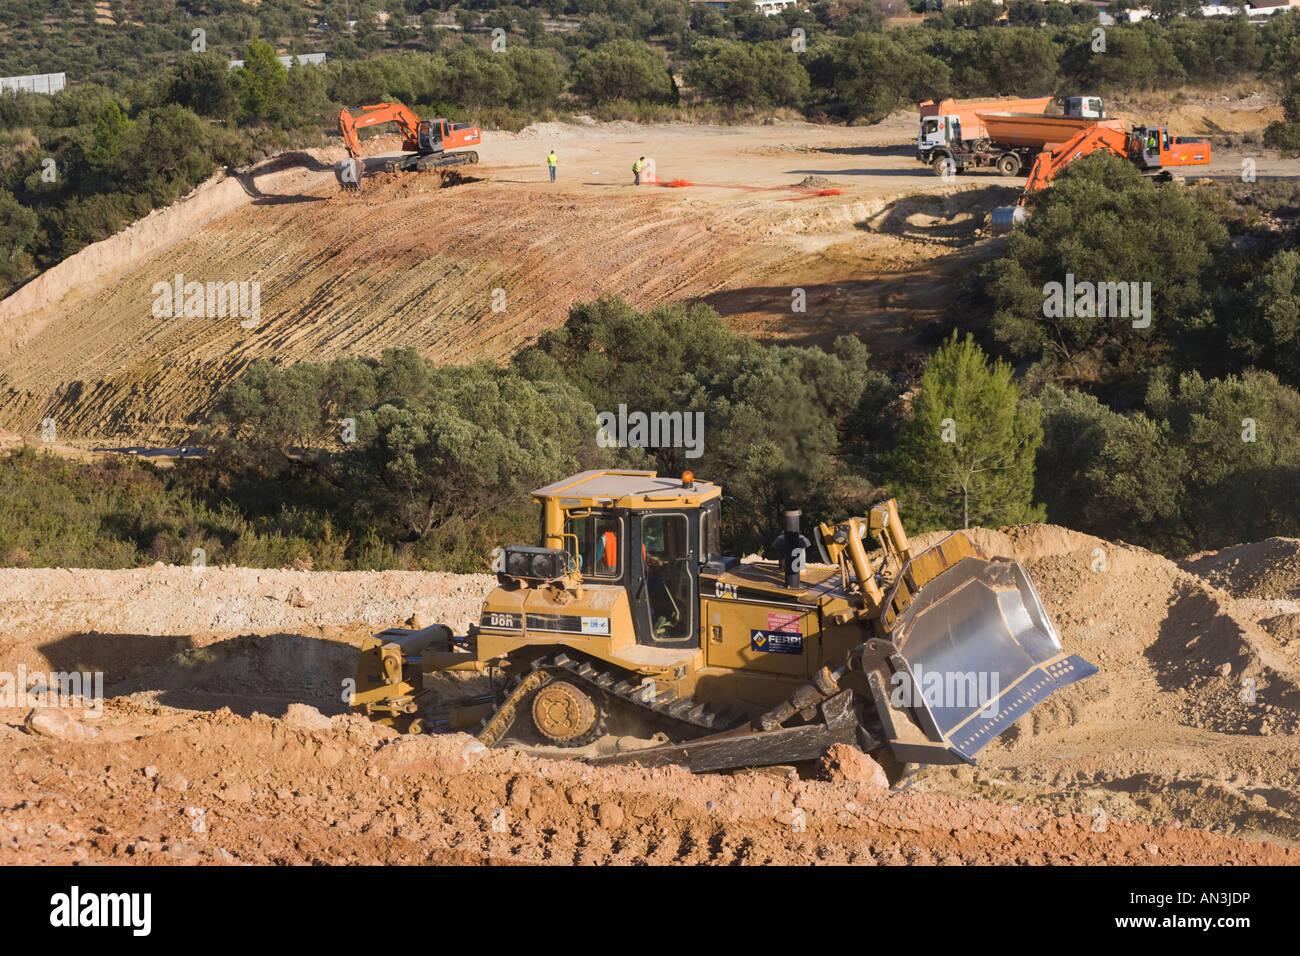 bulldozer mechanical digger and tip trucks at work in spain road